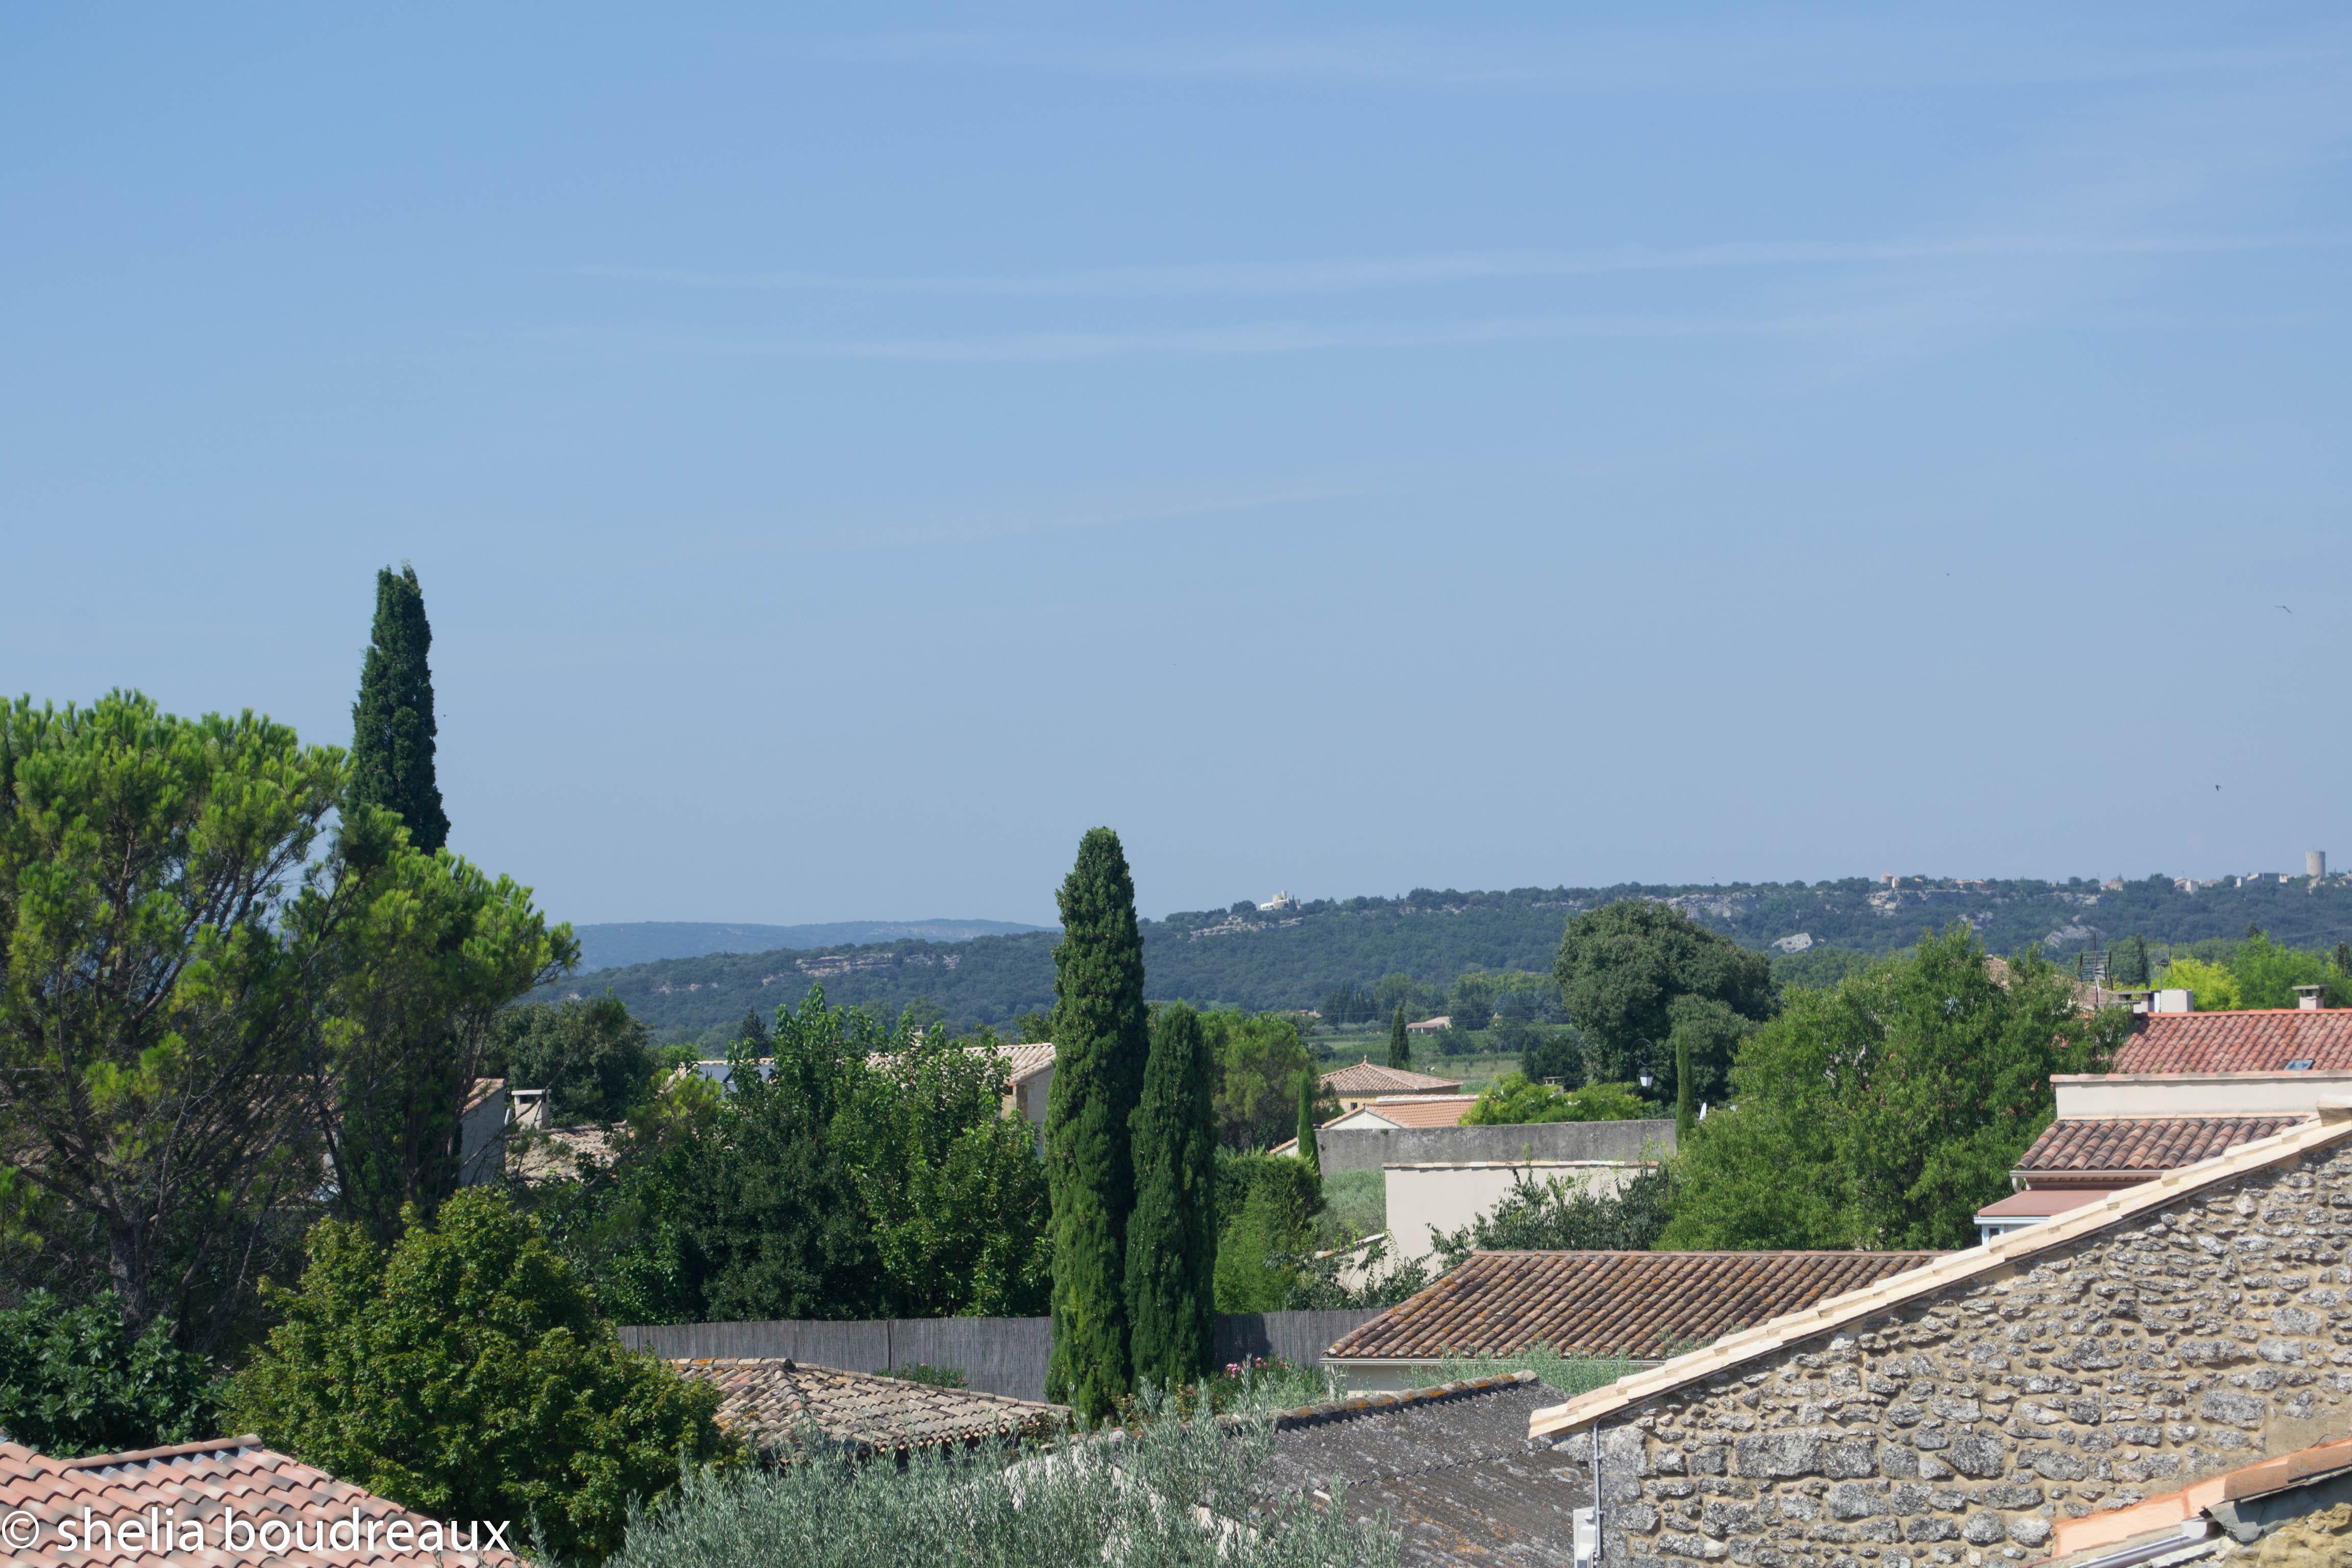 Near Avaignon, South France